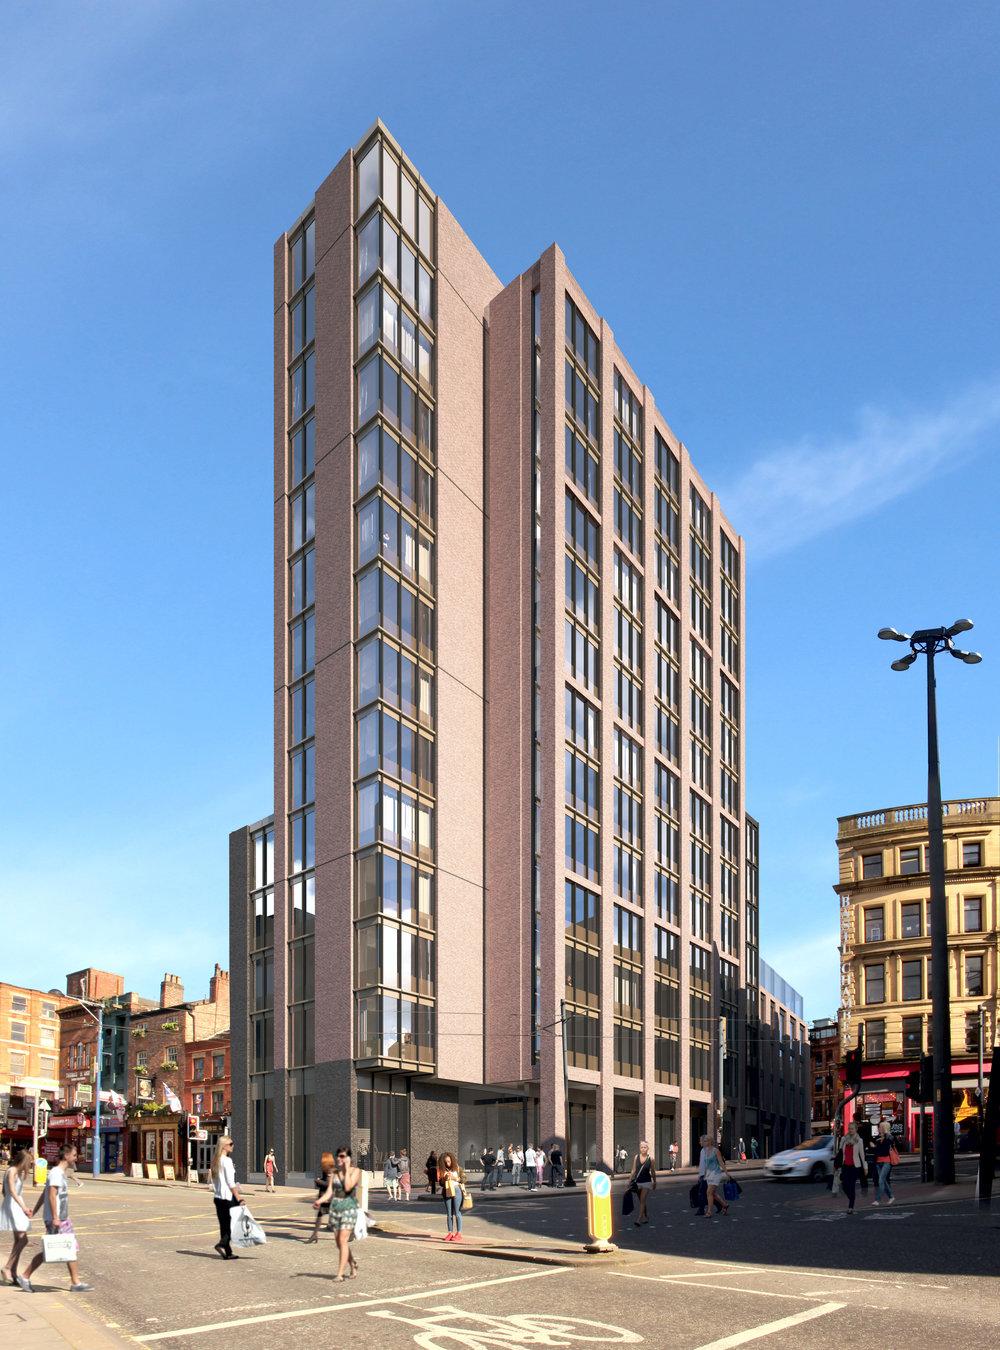 Saxbury-Back-Turner-Street-Apart-Hotel-Leasing-Manchester (3).jpg